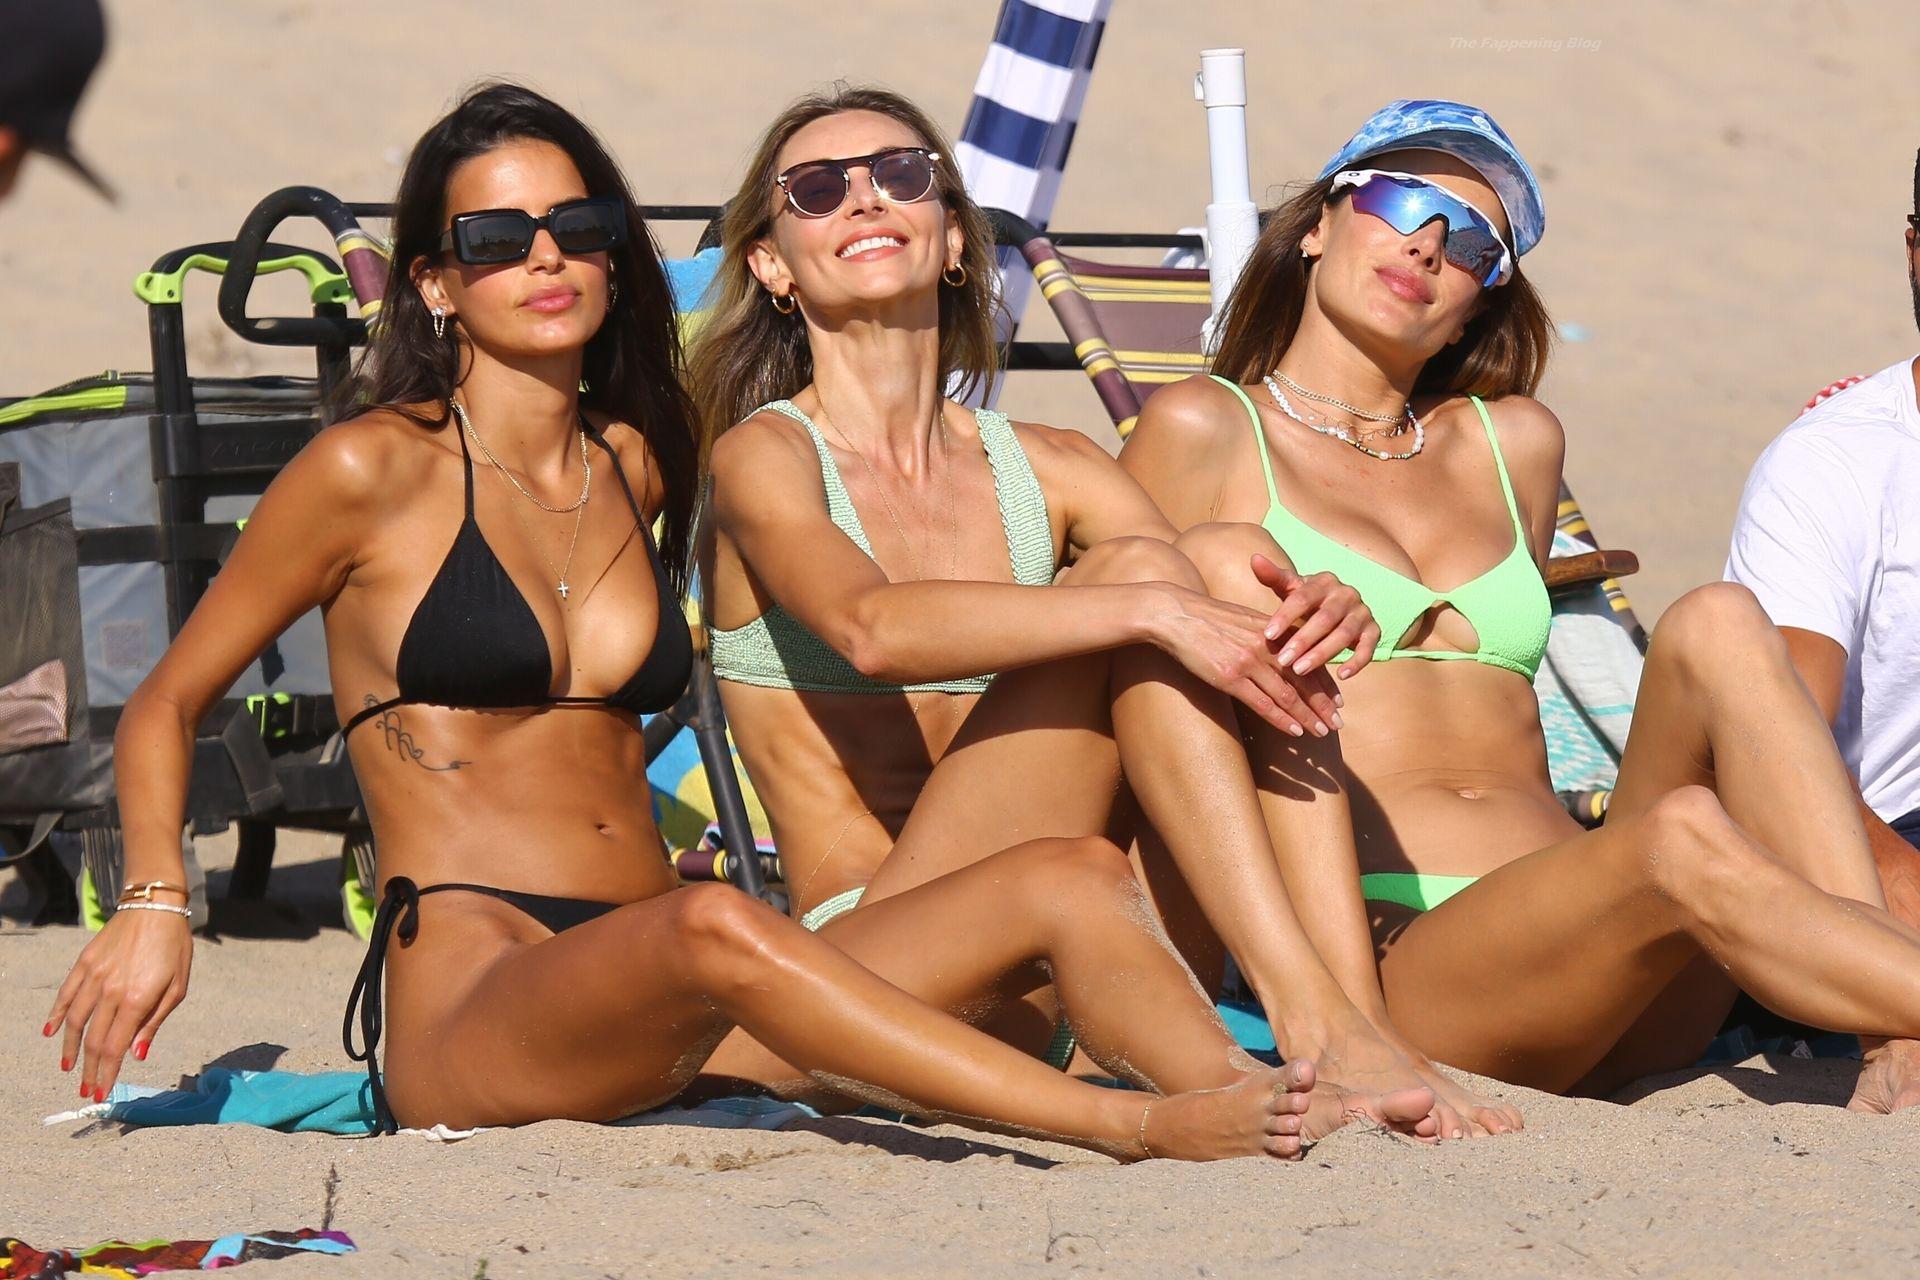 Alessandra-Ambrosio-Sexy-The-Fappening-Blog-801.jpg